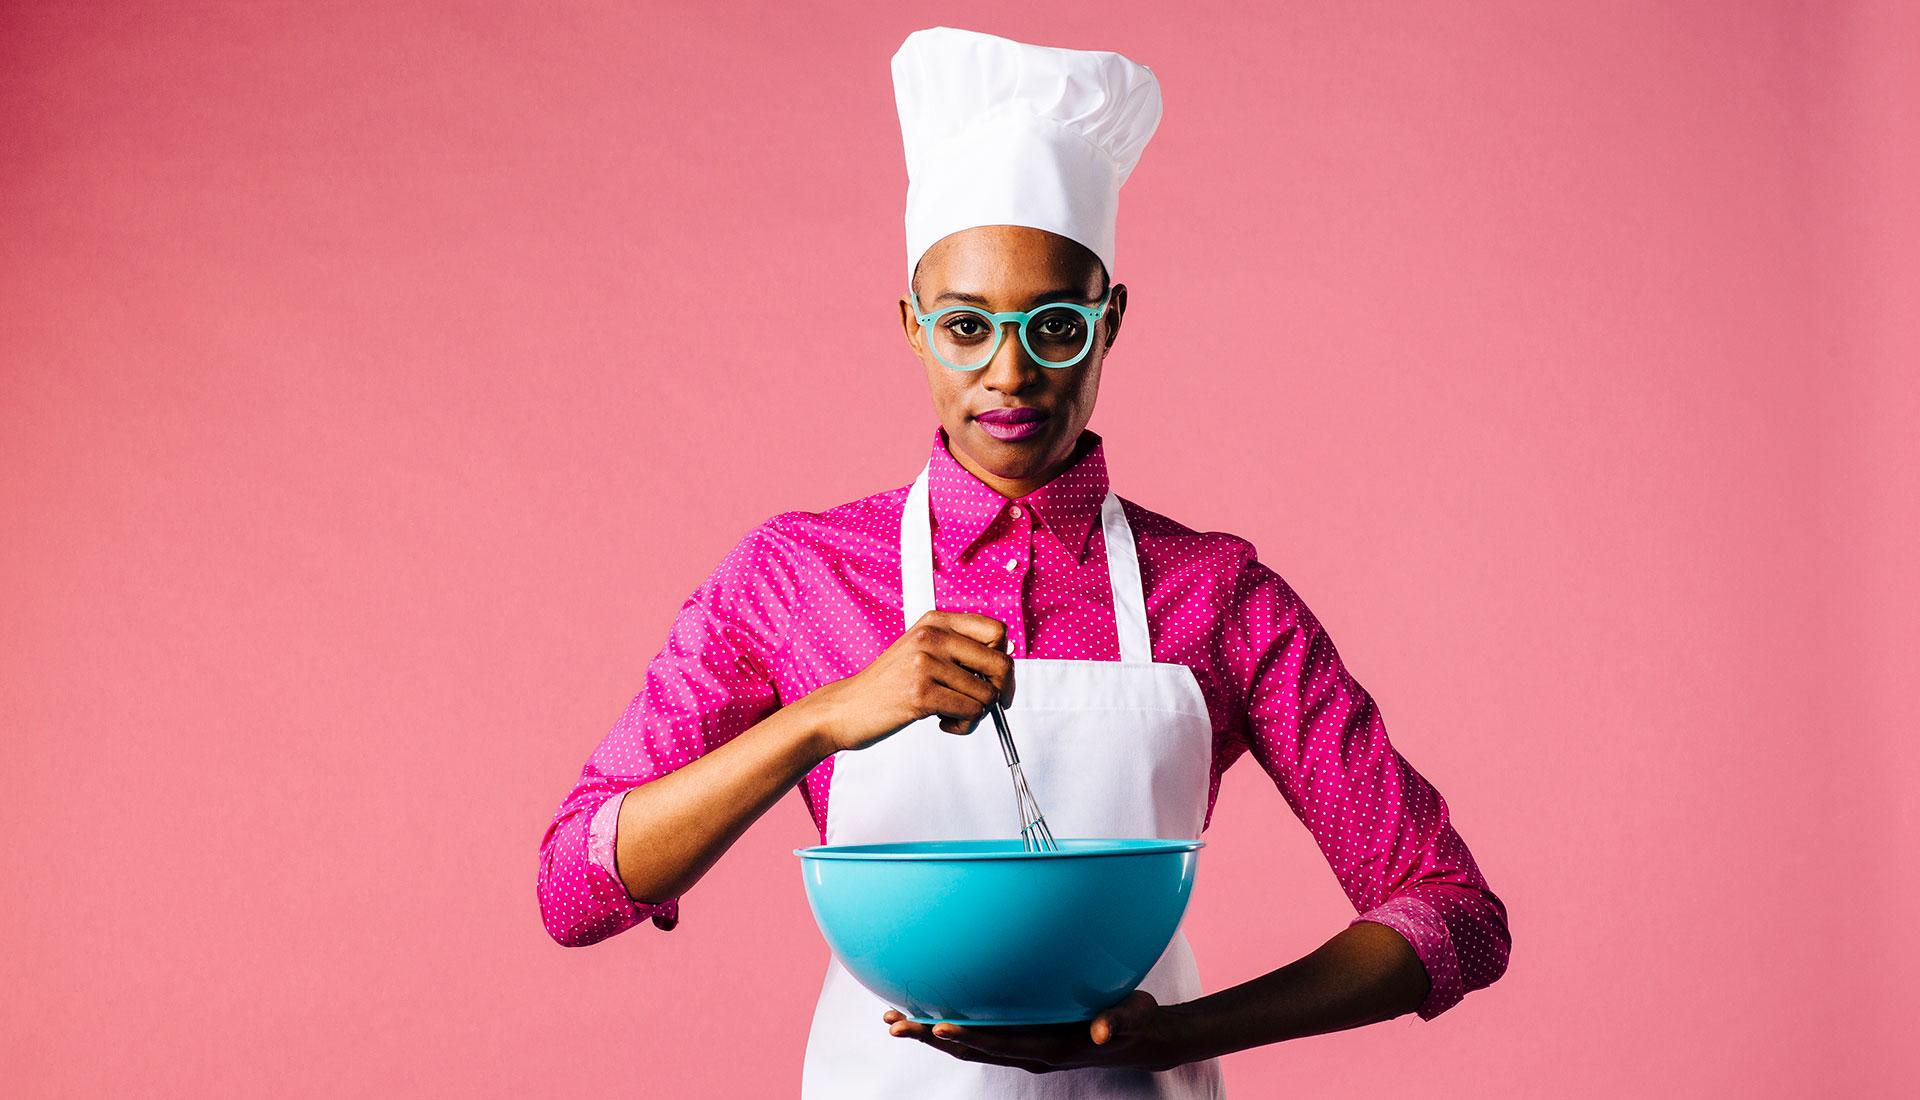 teen baking